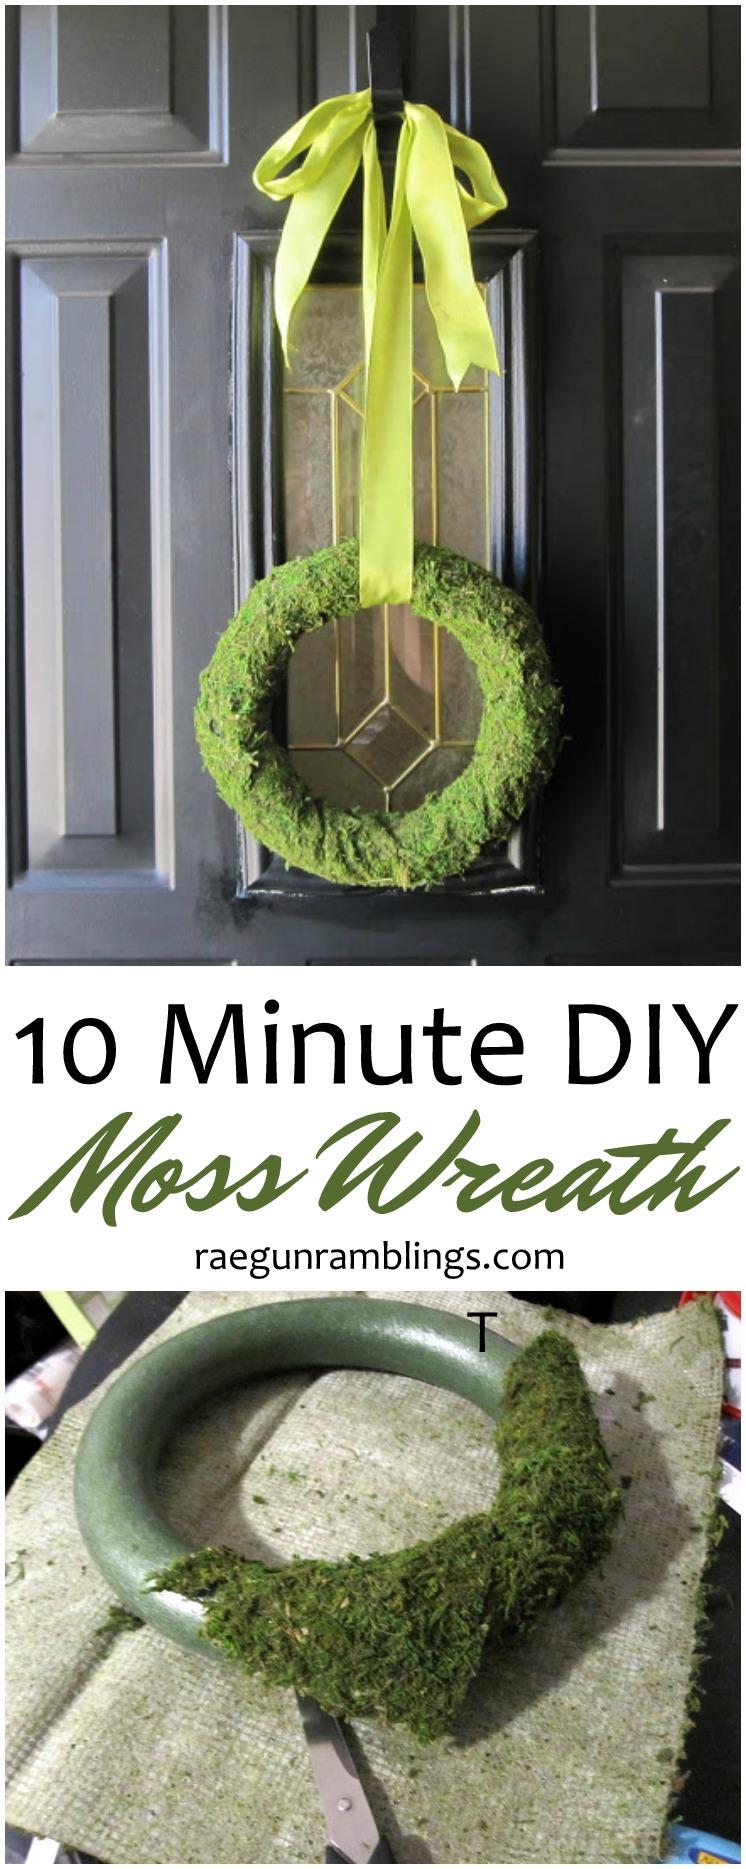 Made this last night. 10 minute DIY Moss Wreath tutorial. Easy festive Spring home decor craft tutorial